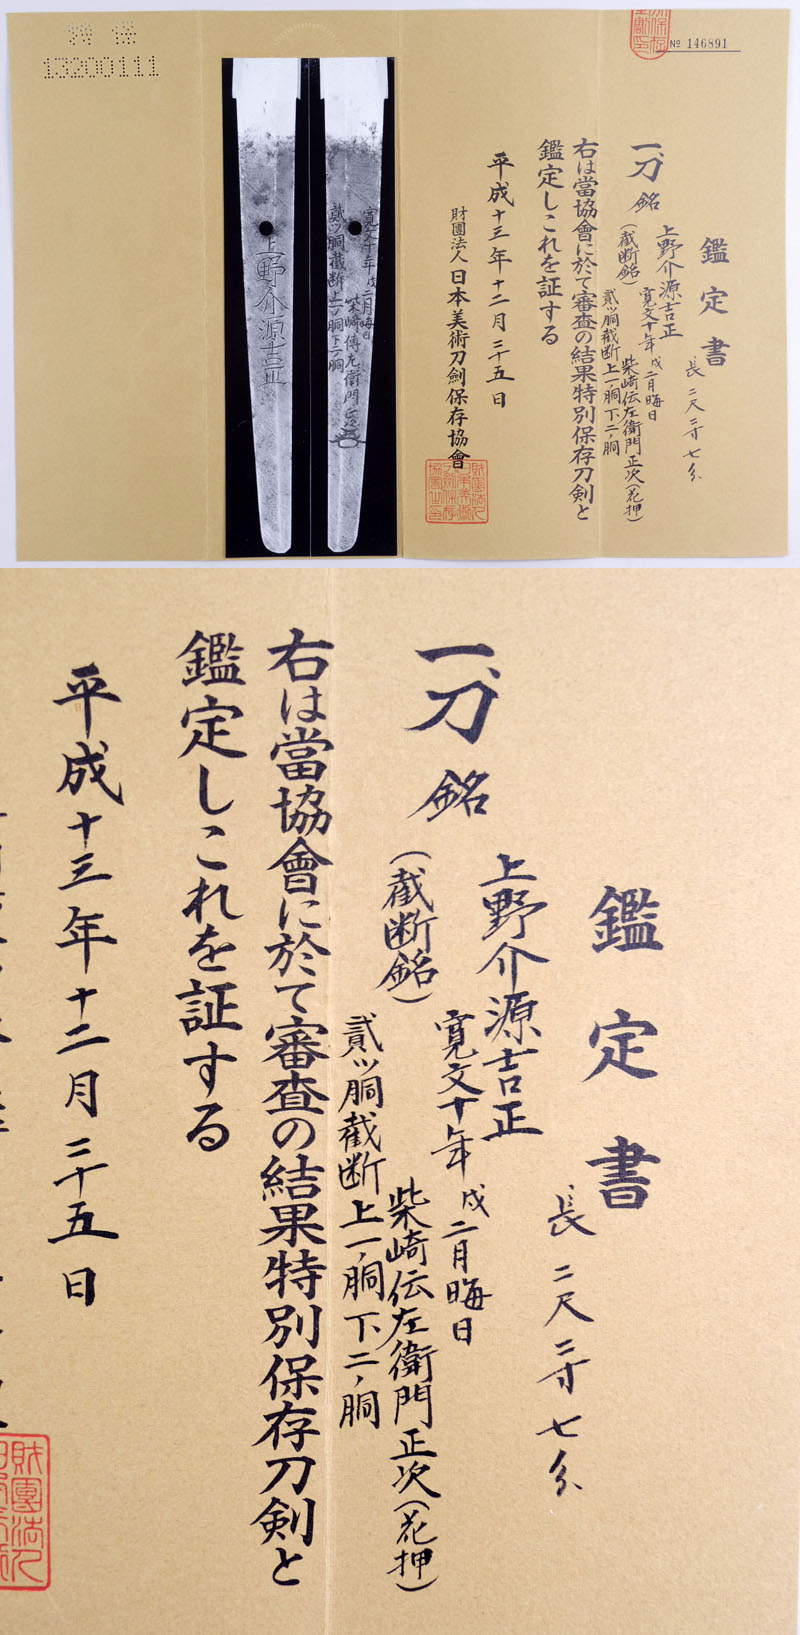 上野介源吉正 Picture of Certificate